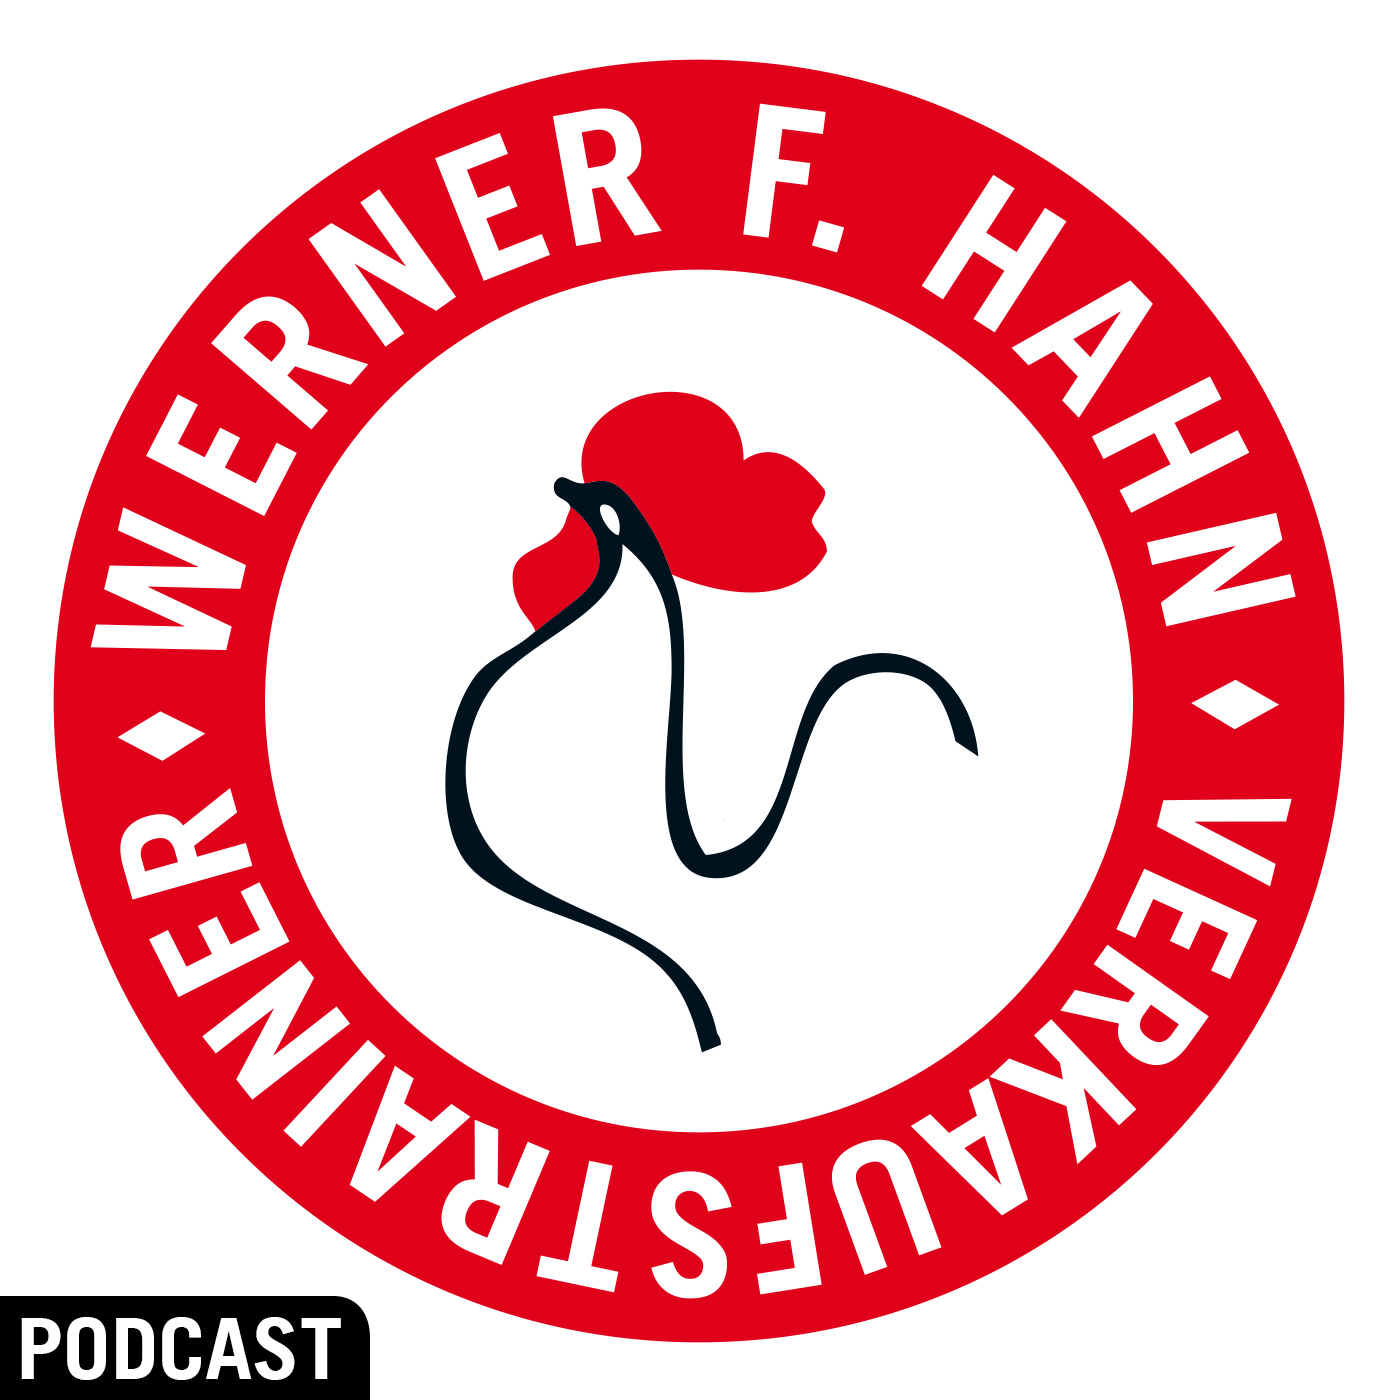 Podcast Hahn_LOGO